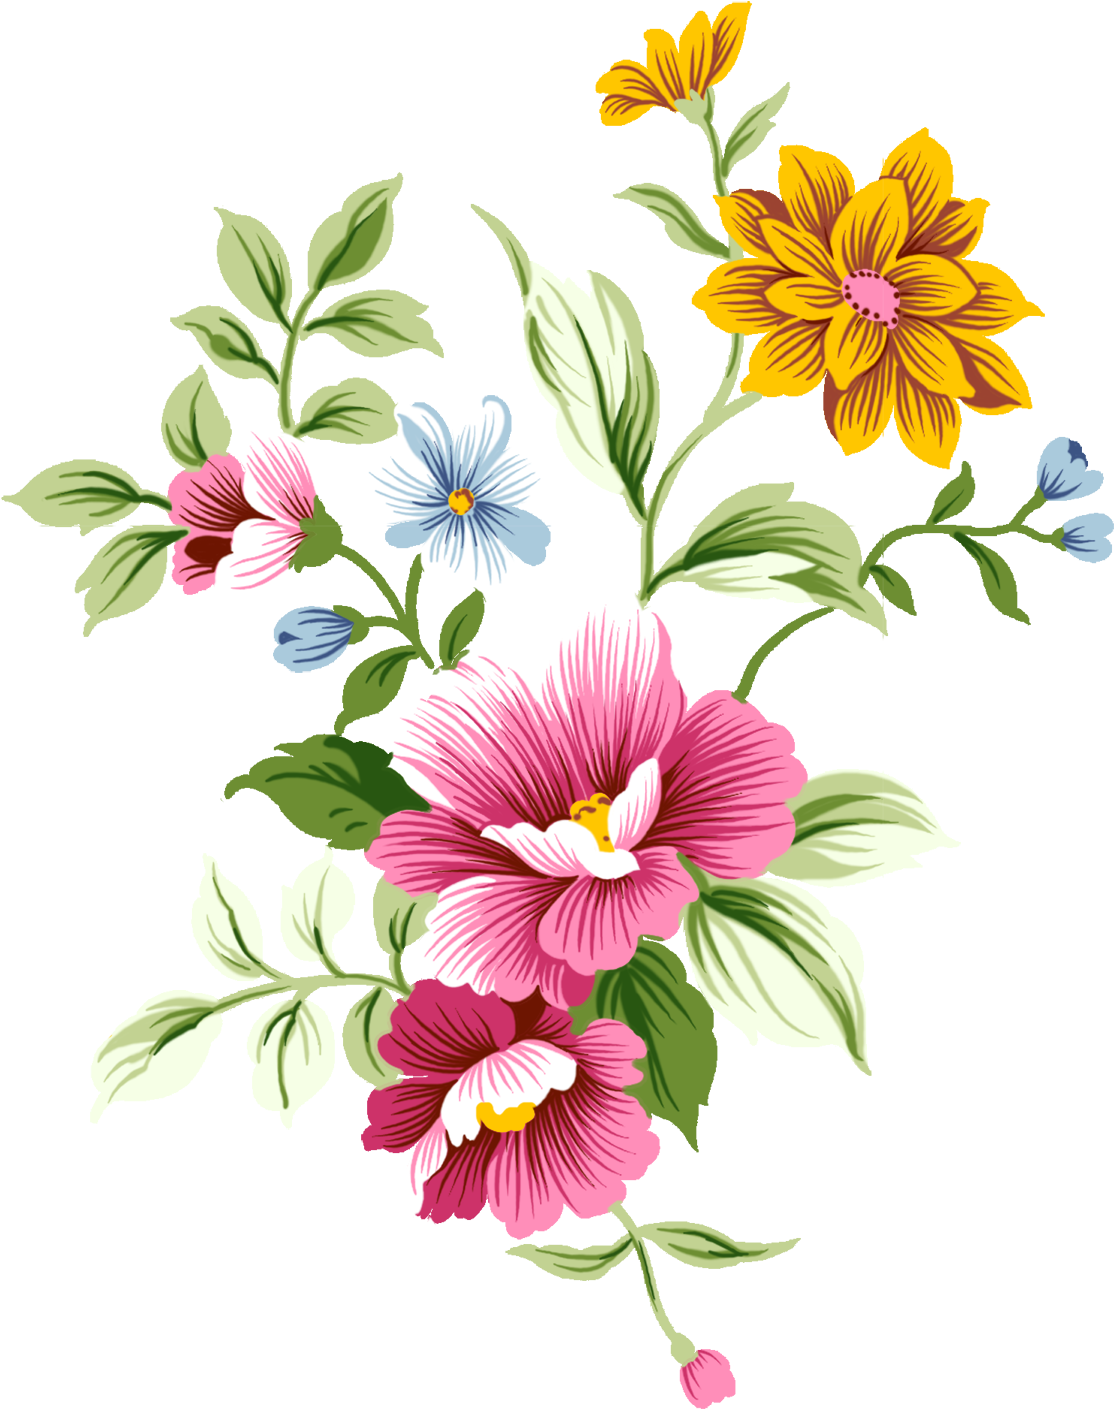 Гугл картинки цветы пнг, утро подруга картинки